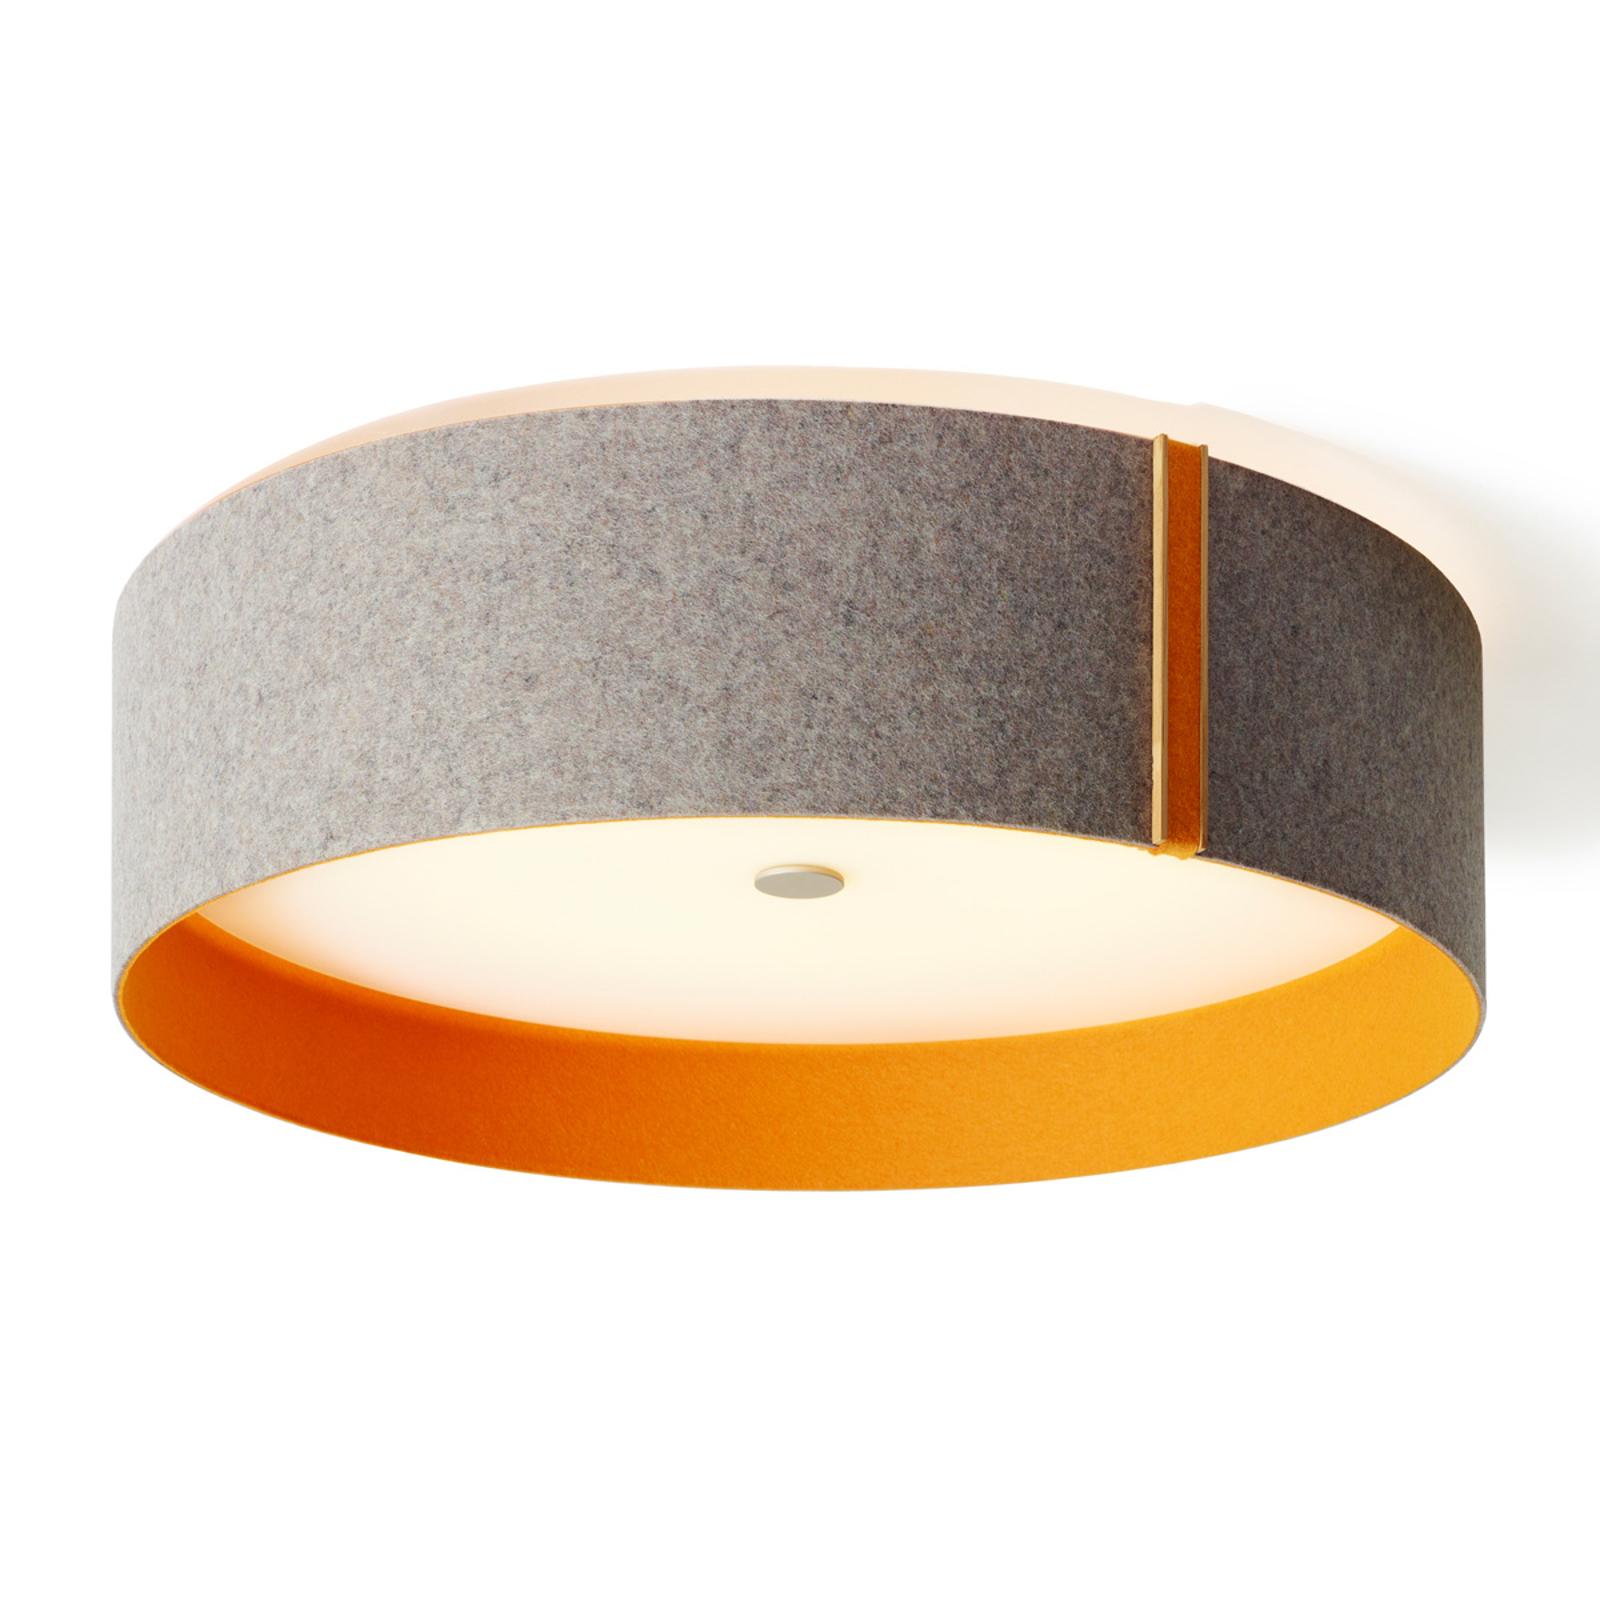 Lara felt - Vilten LED plafondlamp, grijs-oranje